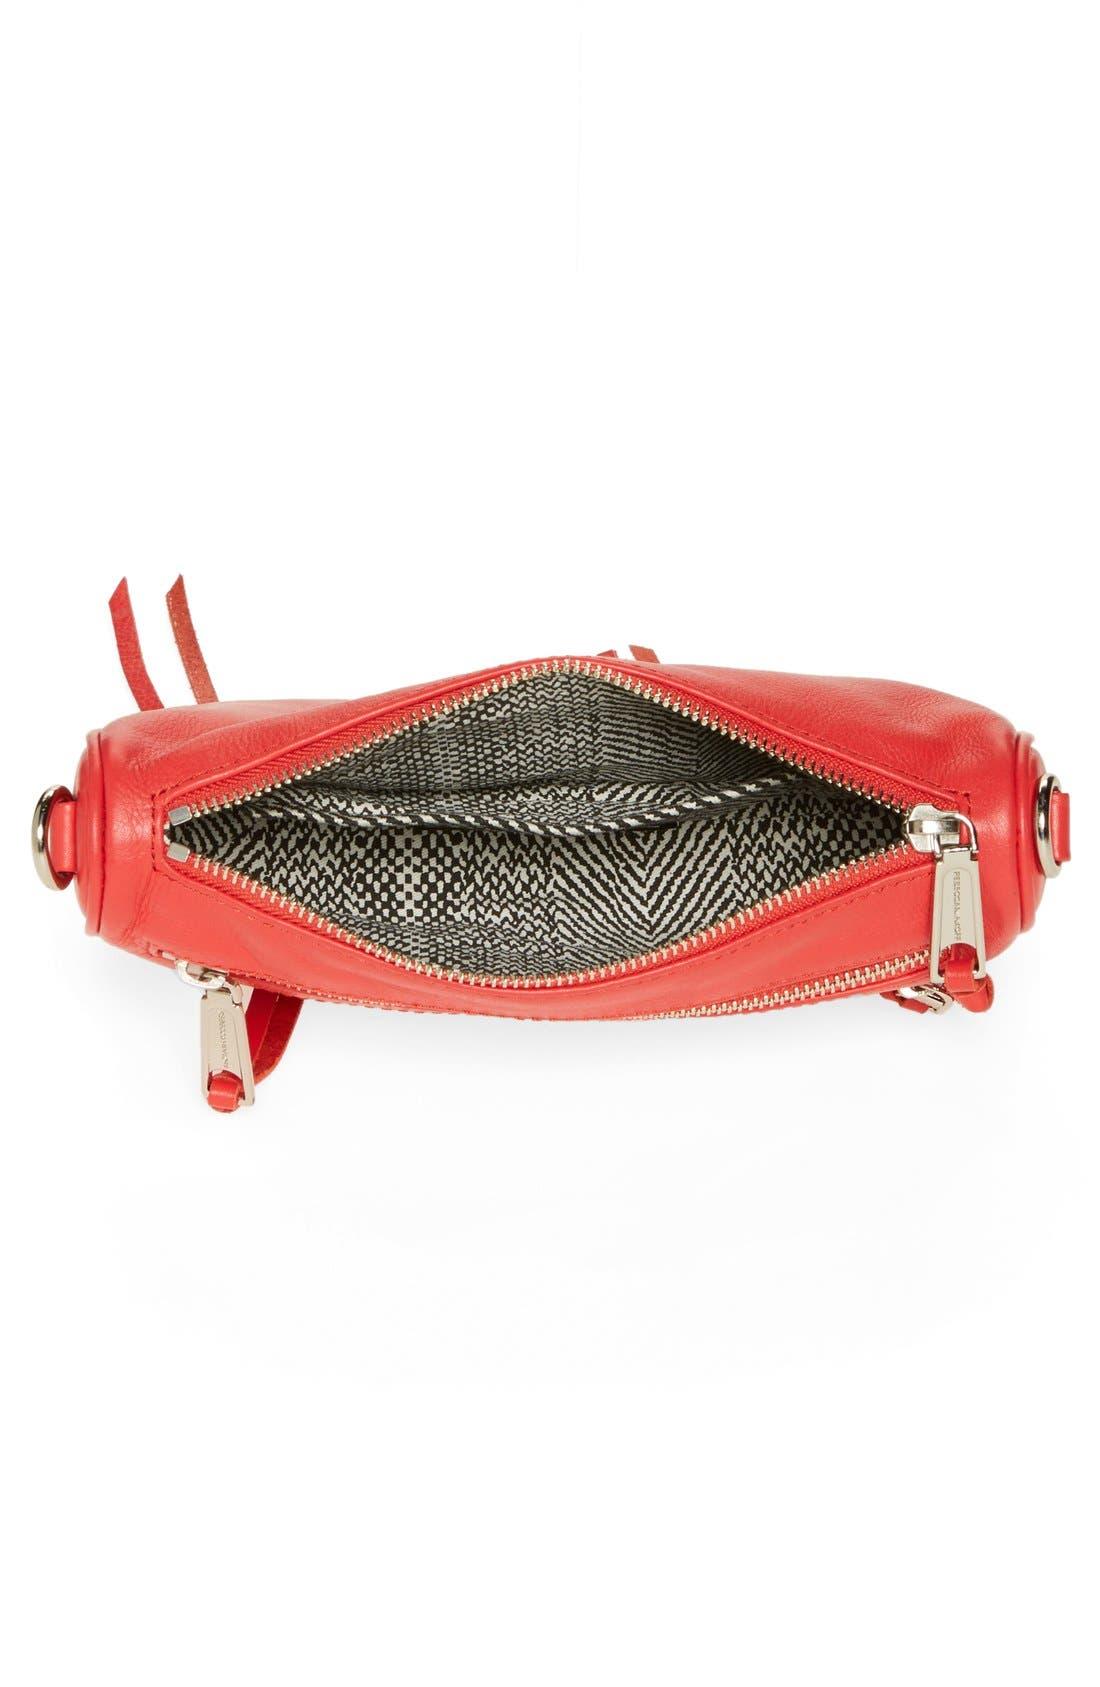 Alternate Image 3  - Rebecca Minkoff 'Mini 5 Zip' Convertible Crossbody Bag